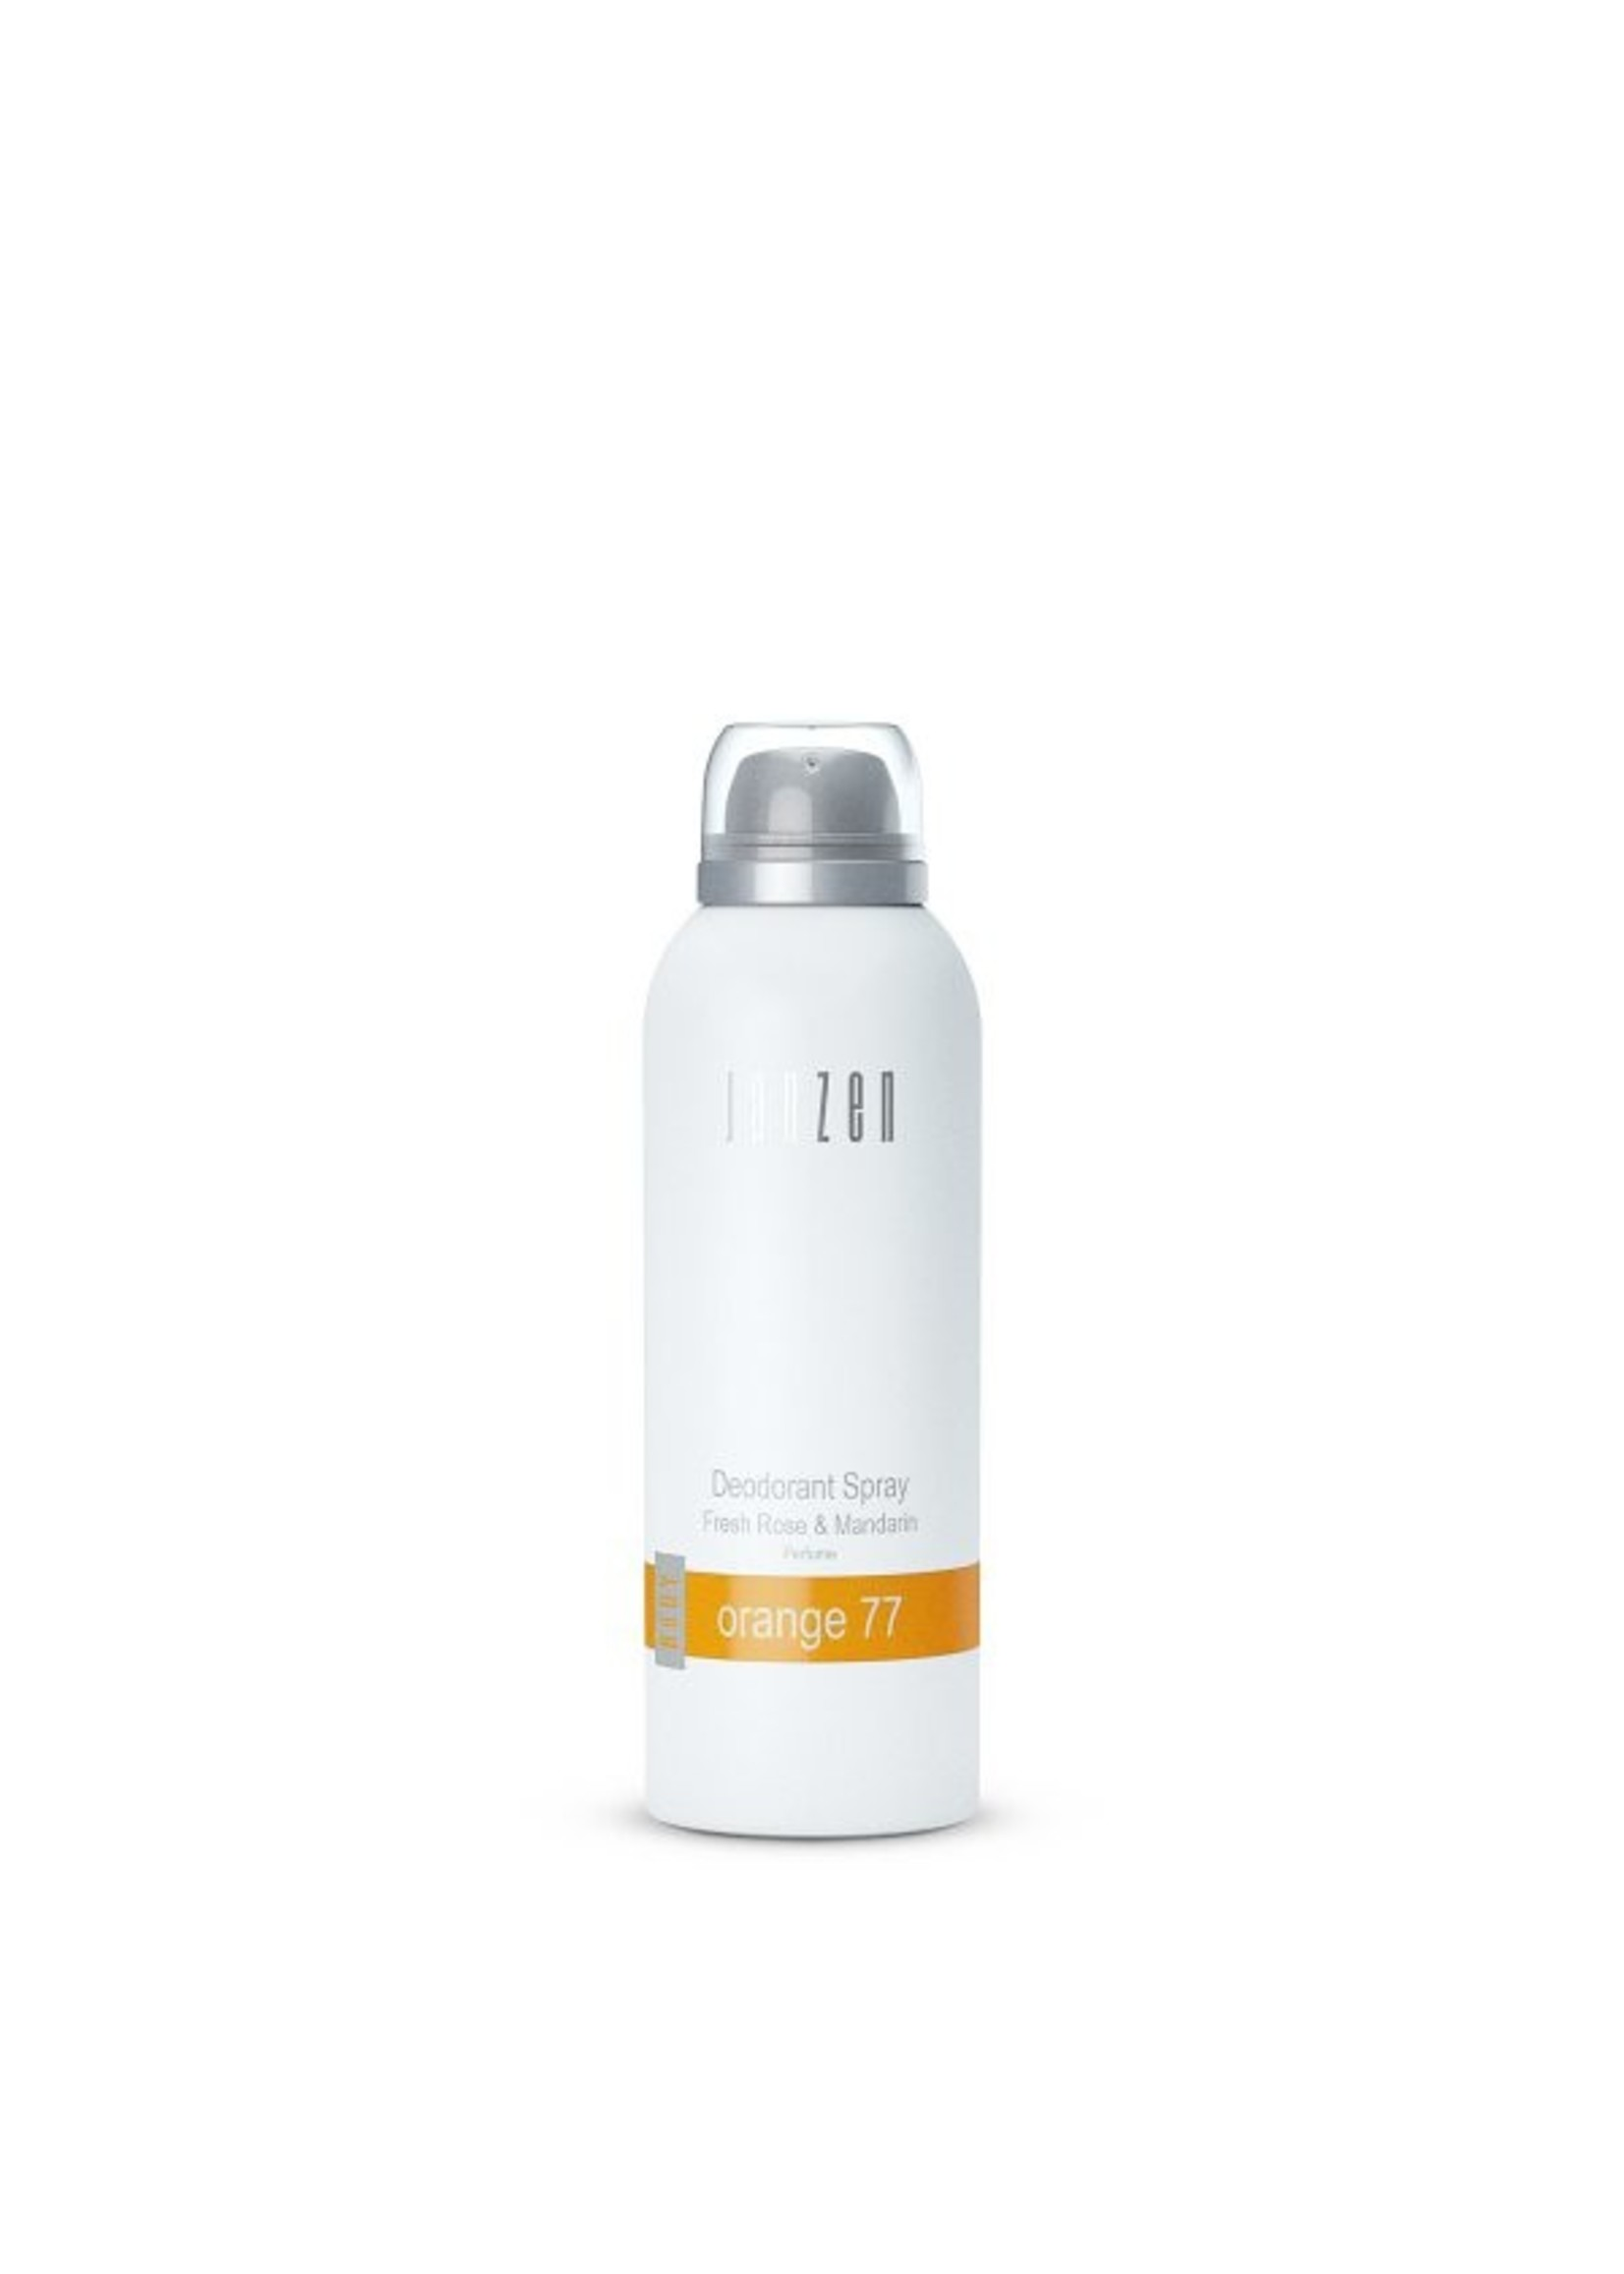 Janzen JANZEN Deodorant Spray Orange 77